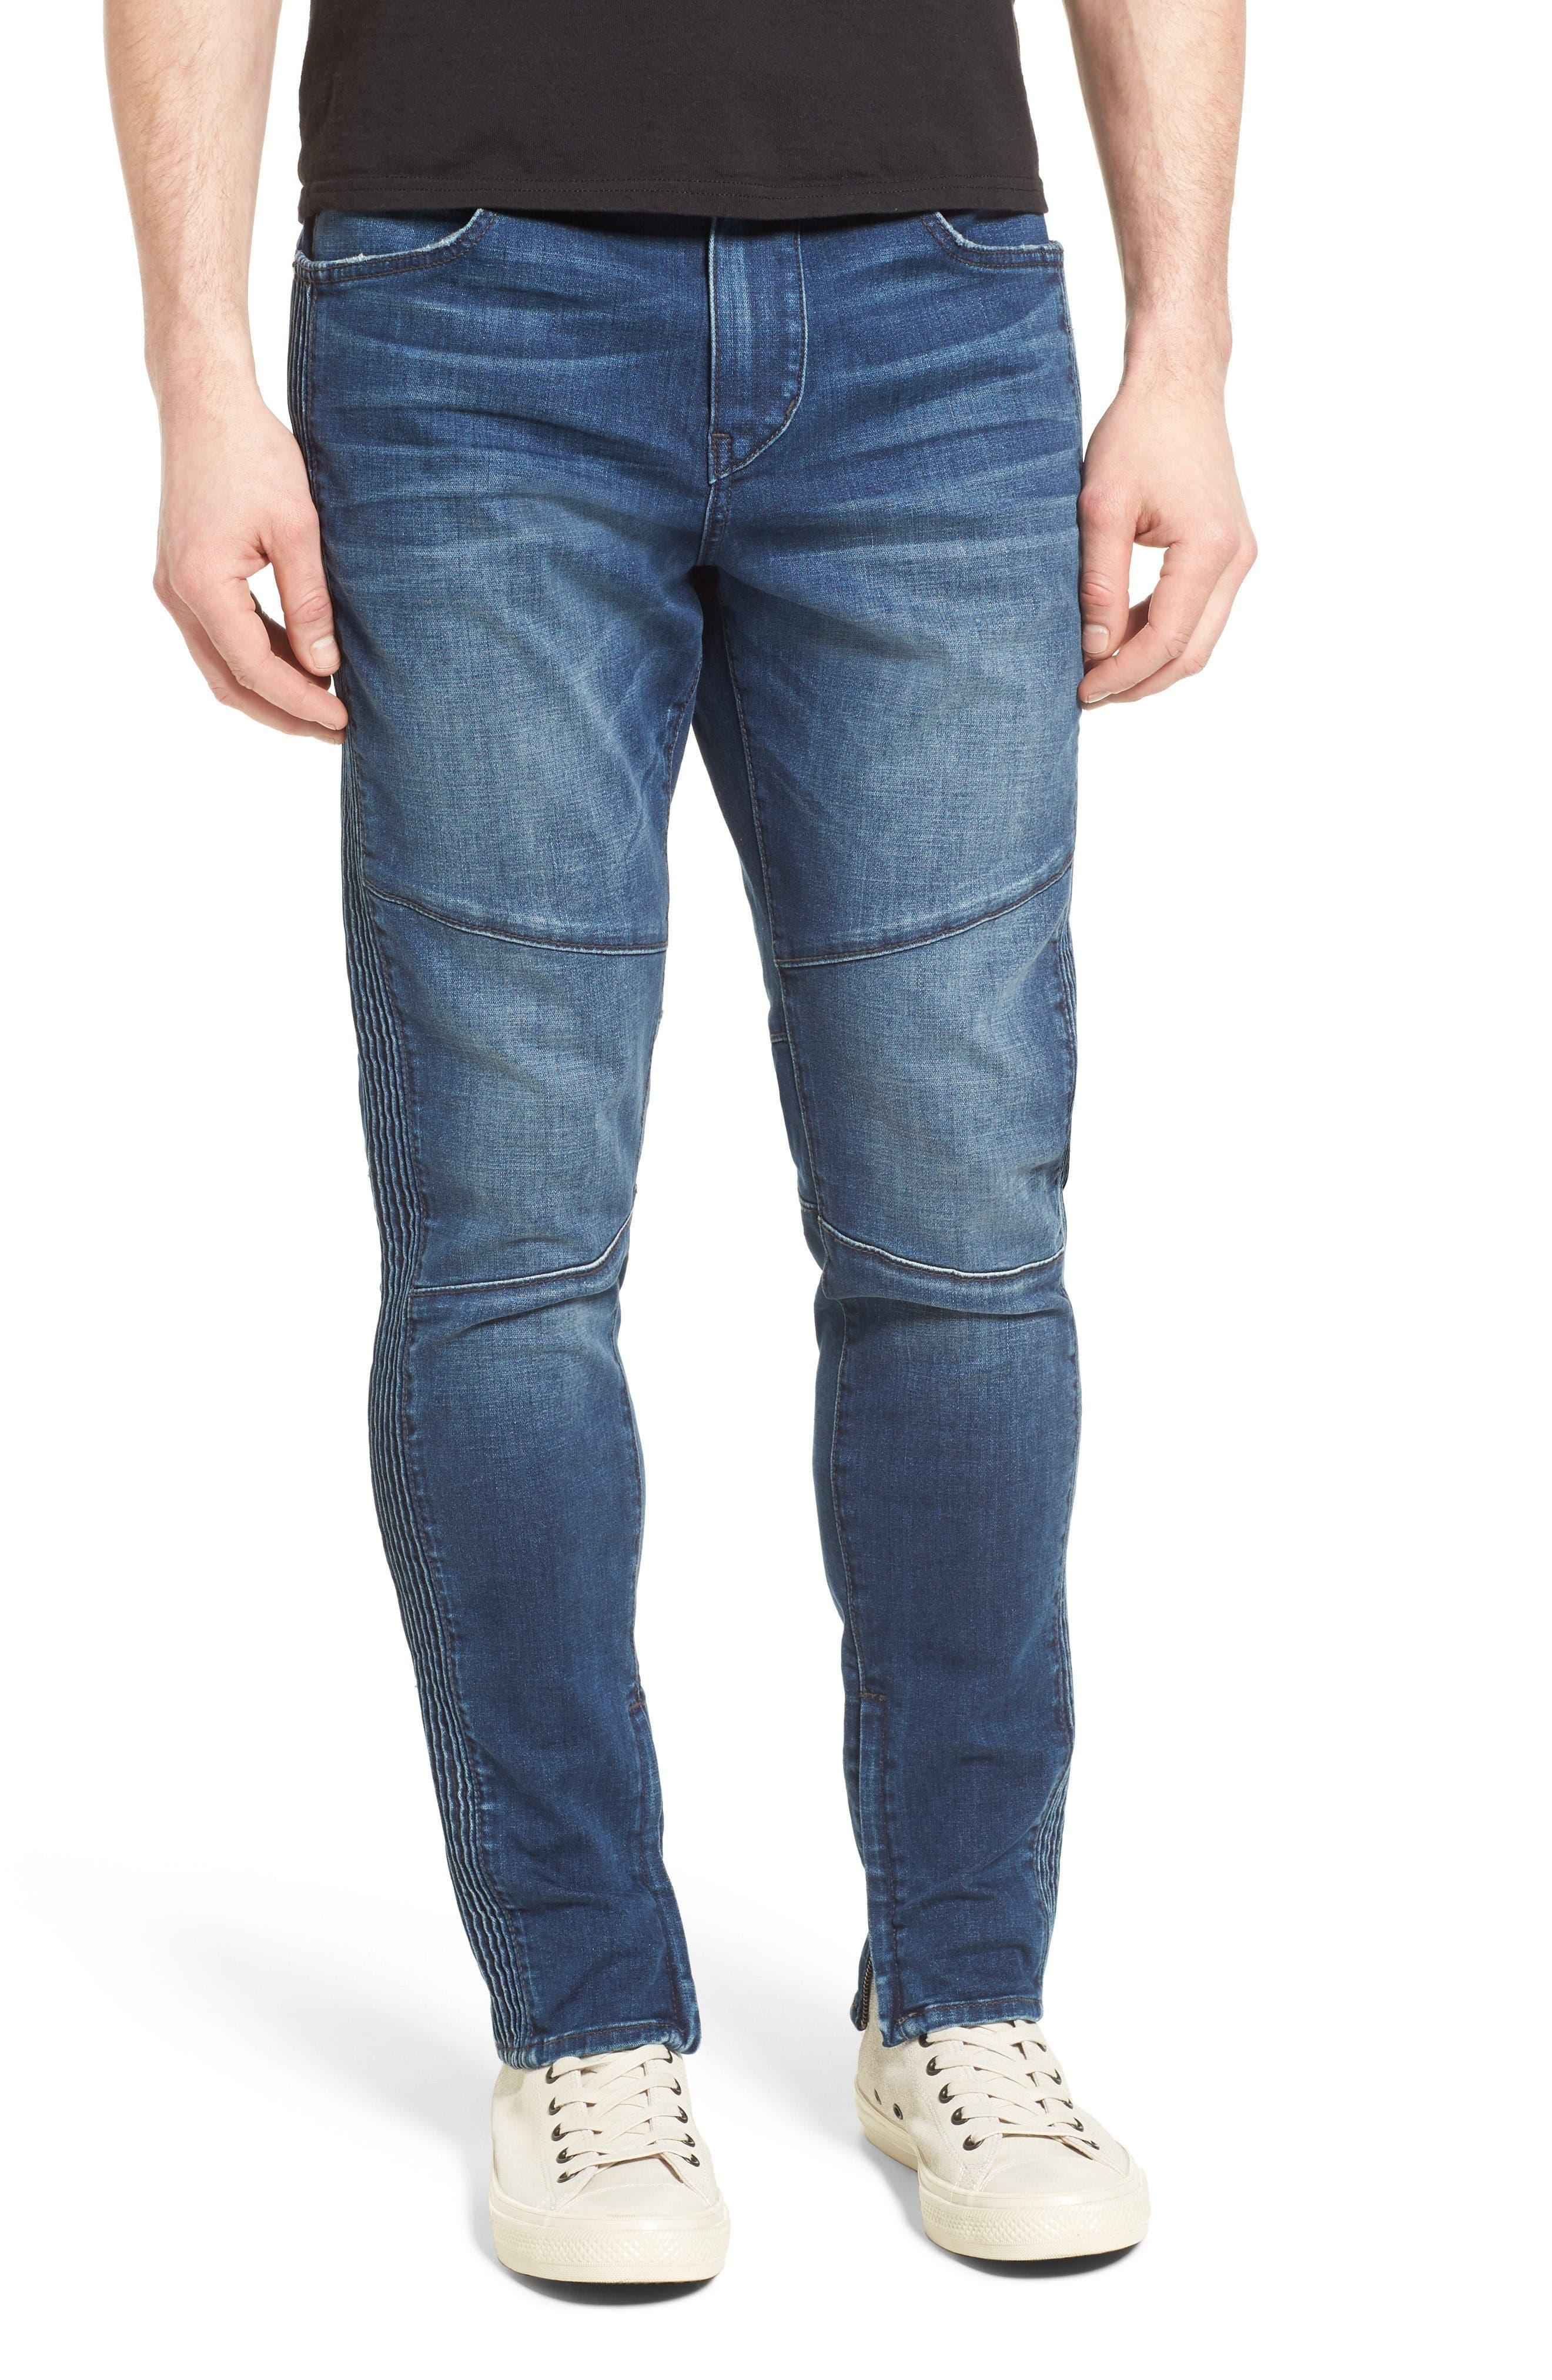 True Religion Brand Jeans Racer Skinny Fit Jeans (Whiskey Blues)